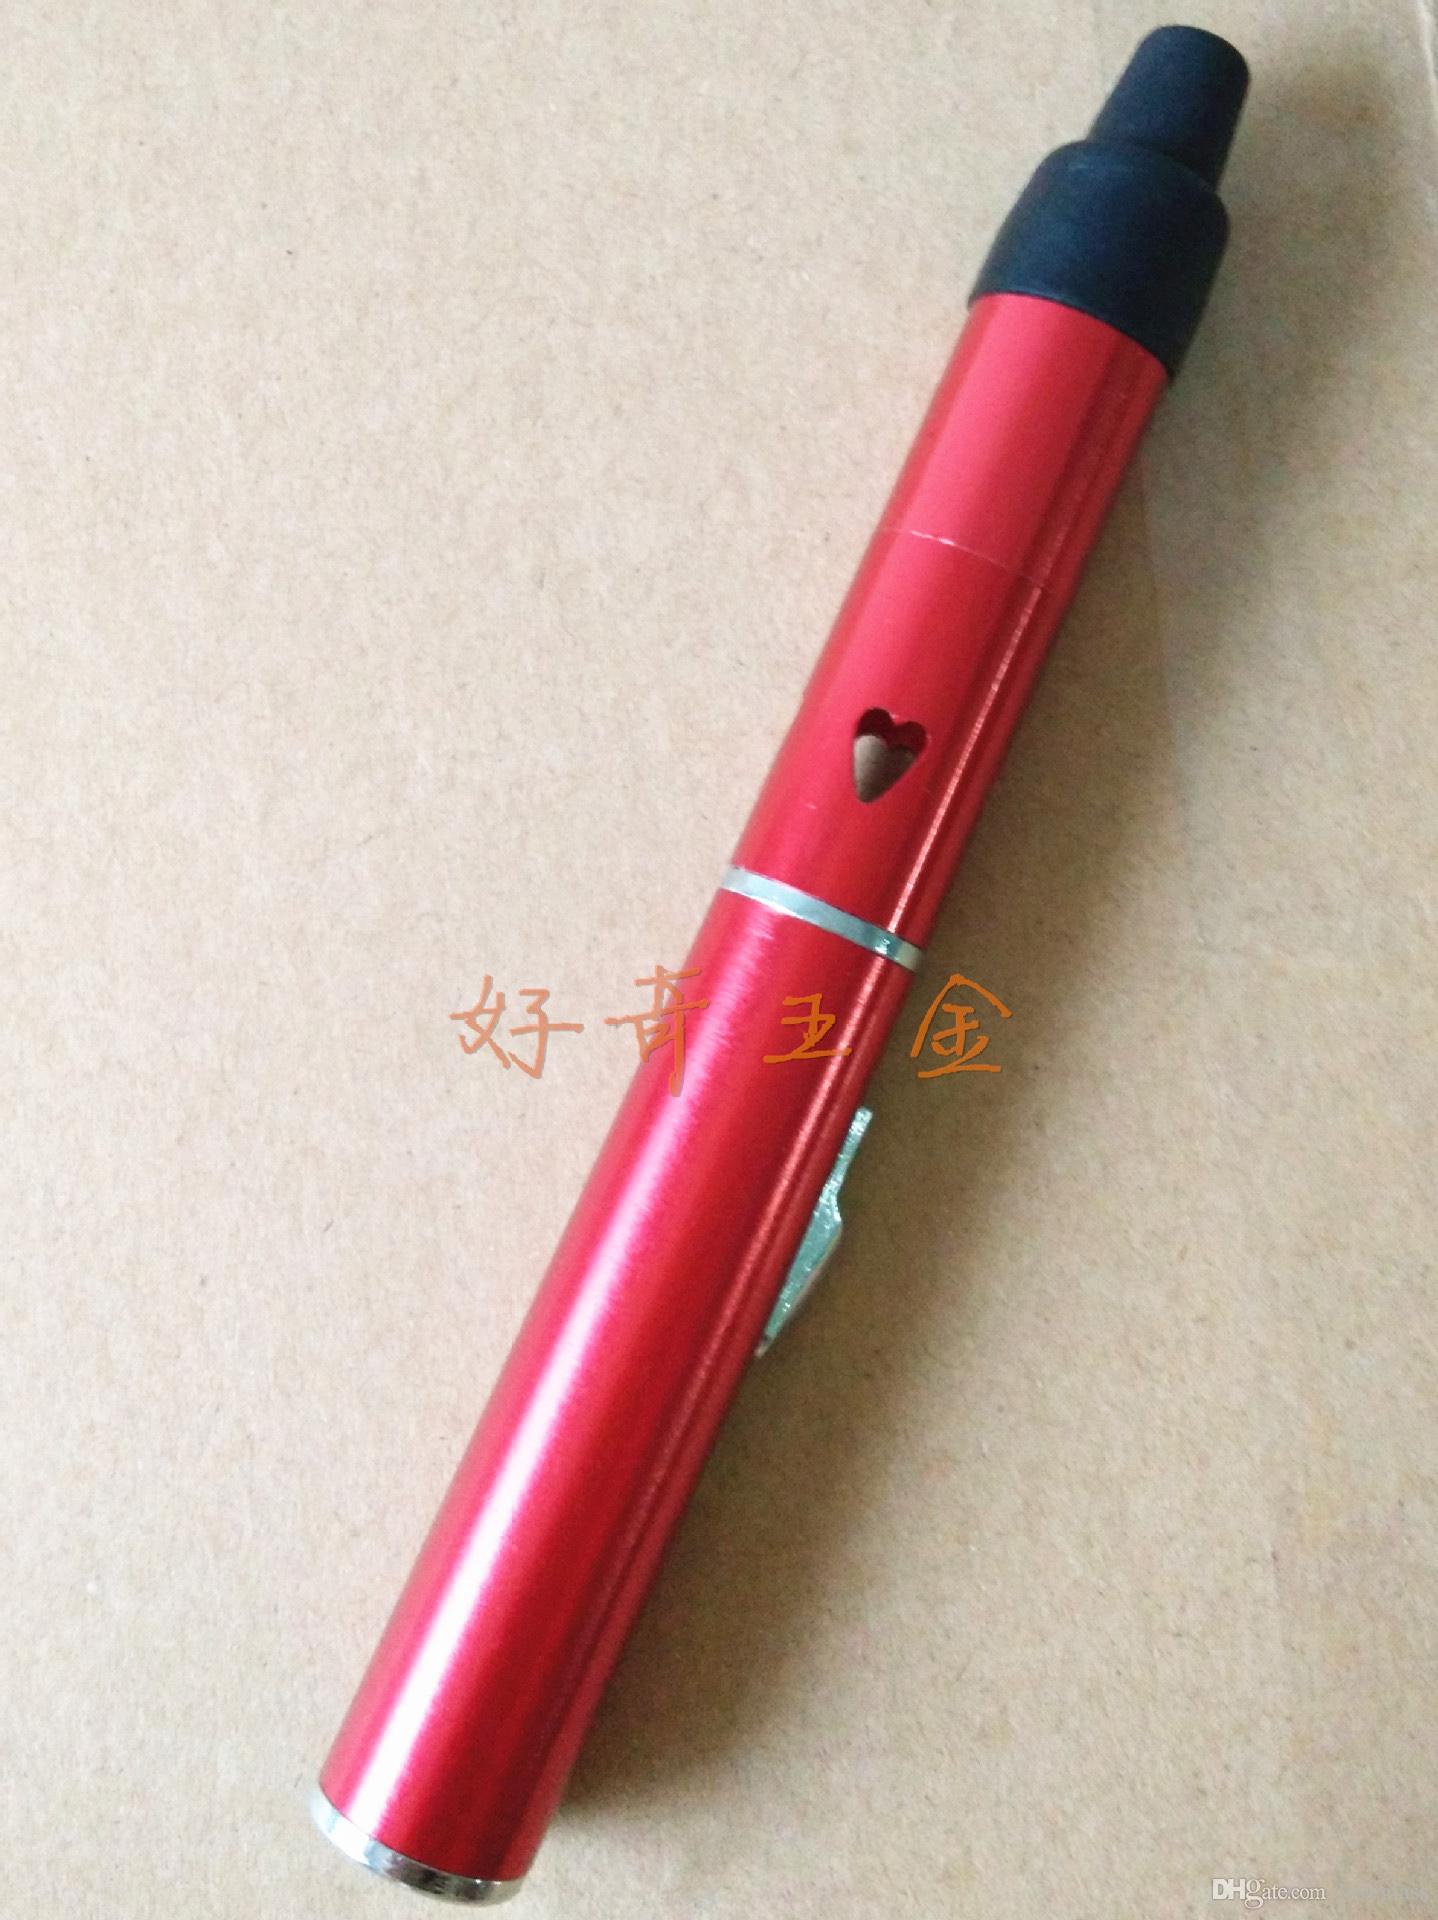 MS pipe burning incense machine into the lighter tobacco cigarette filter pipe Sepiolite